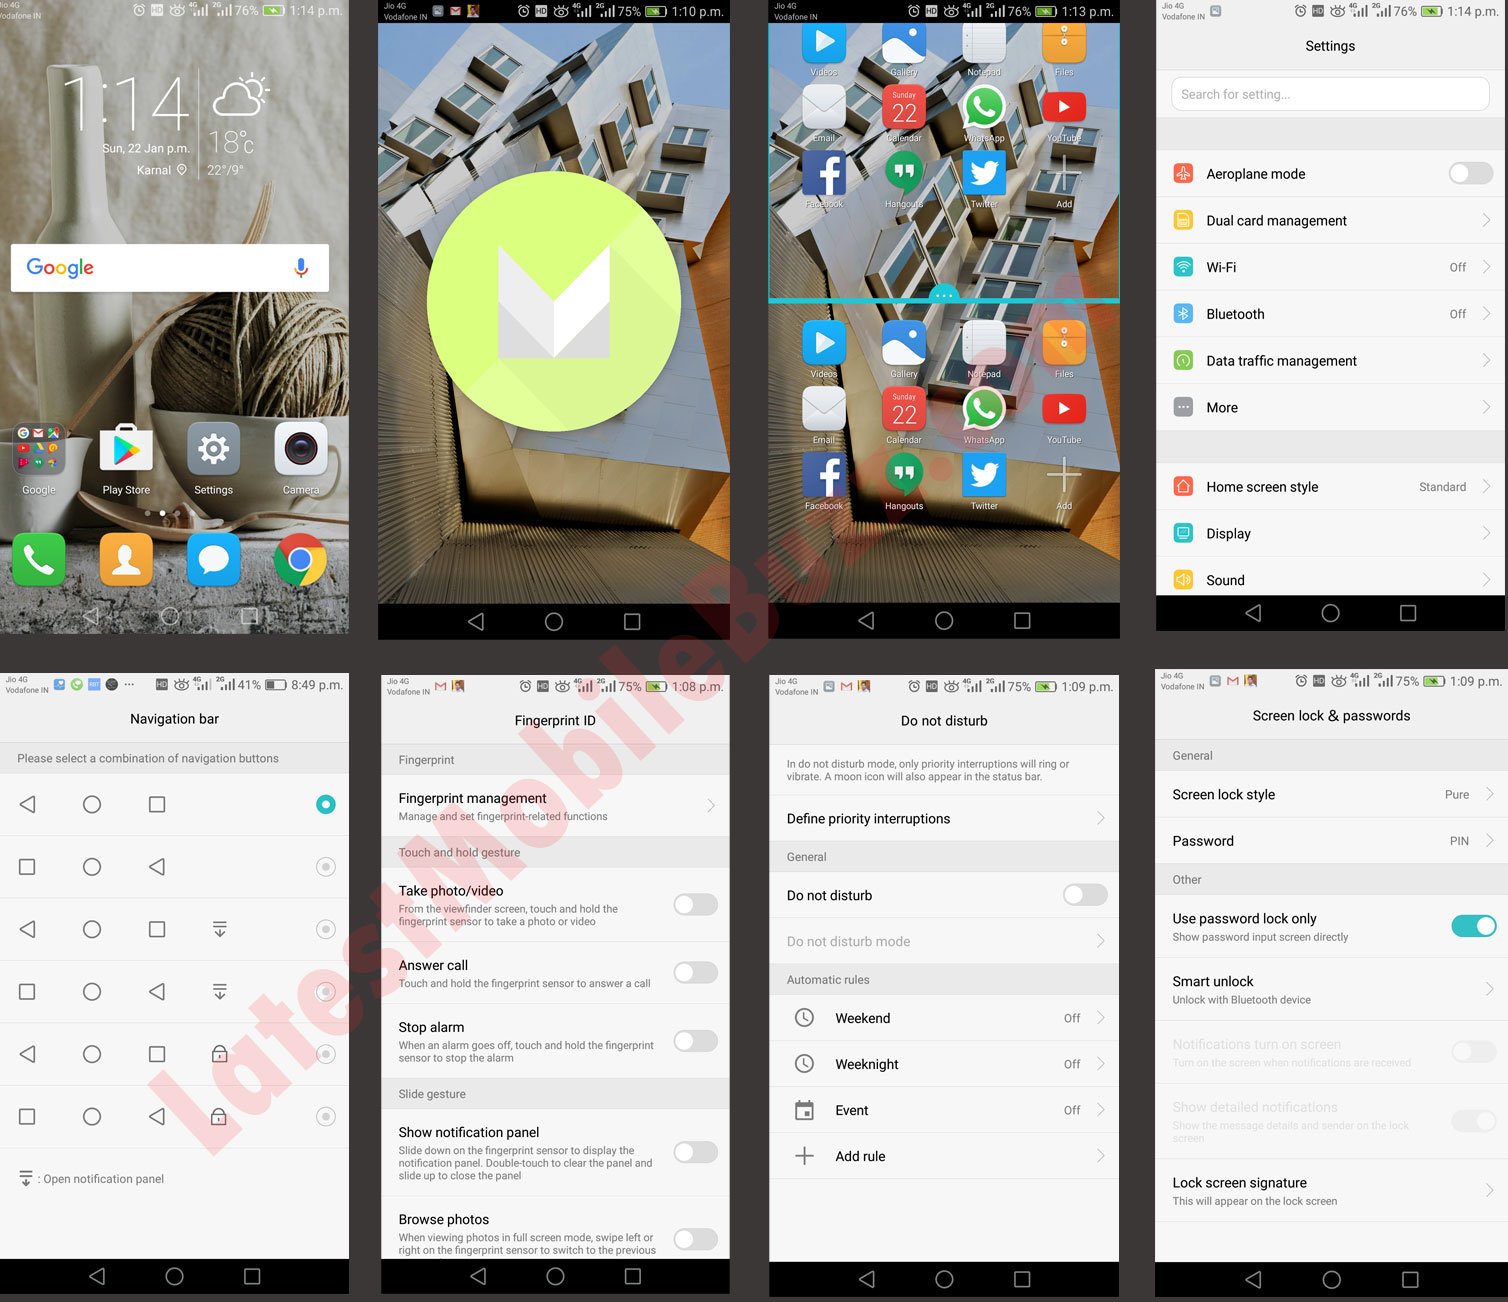 Honor 6x Software UI